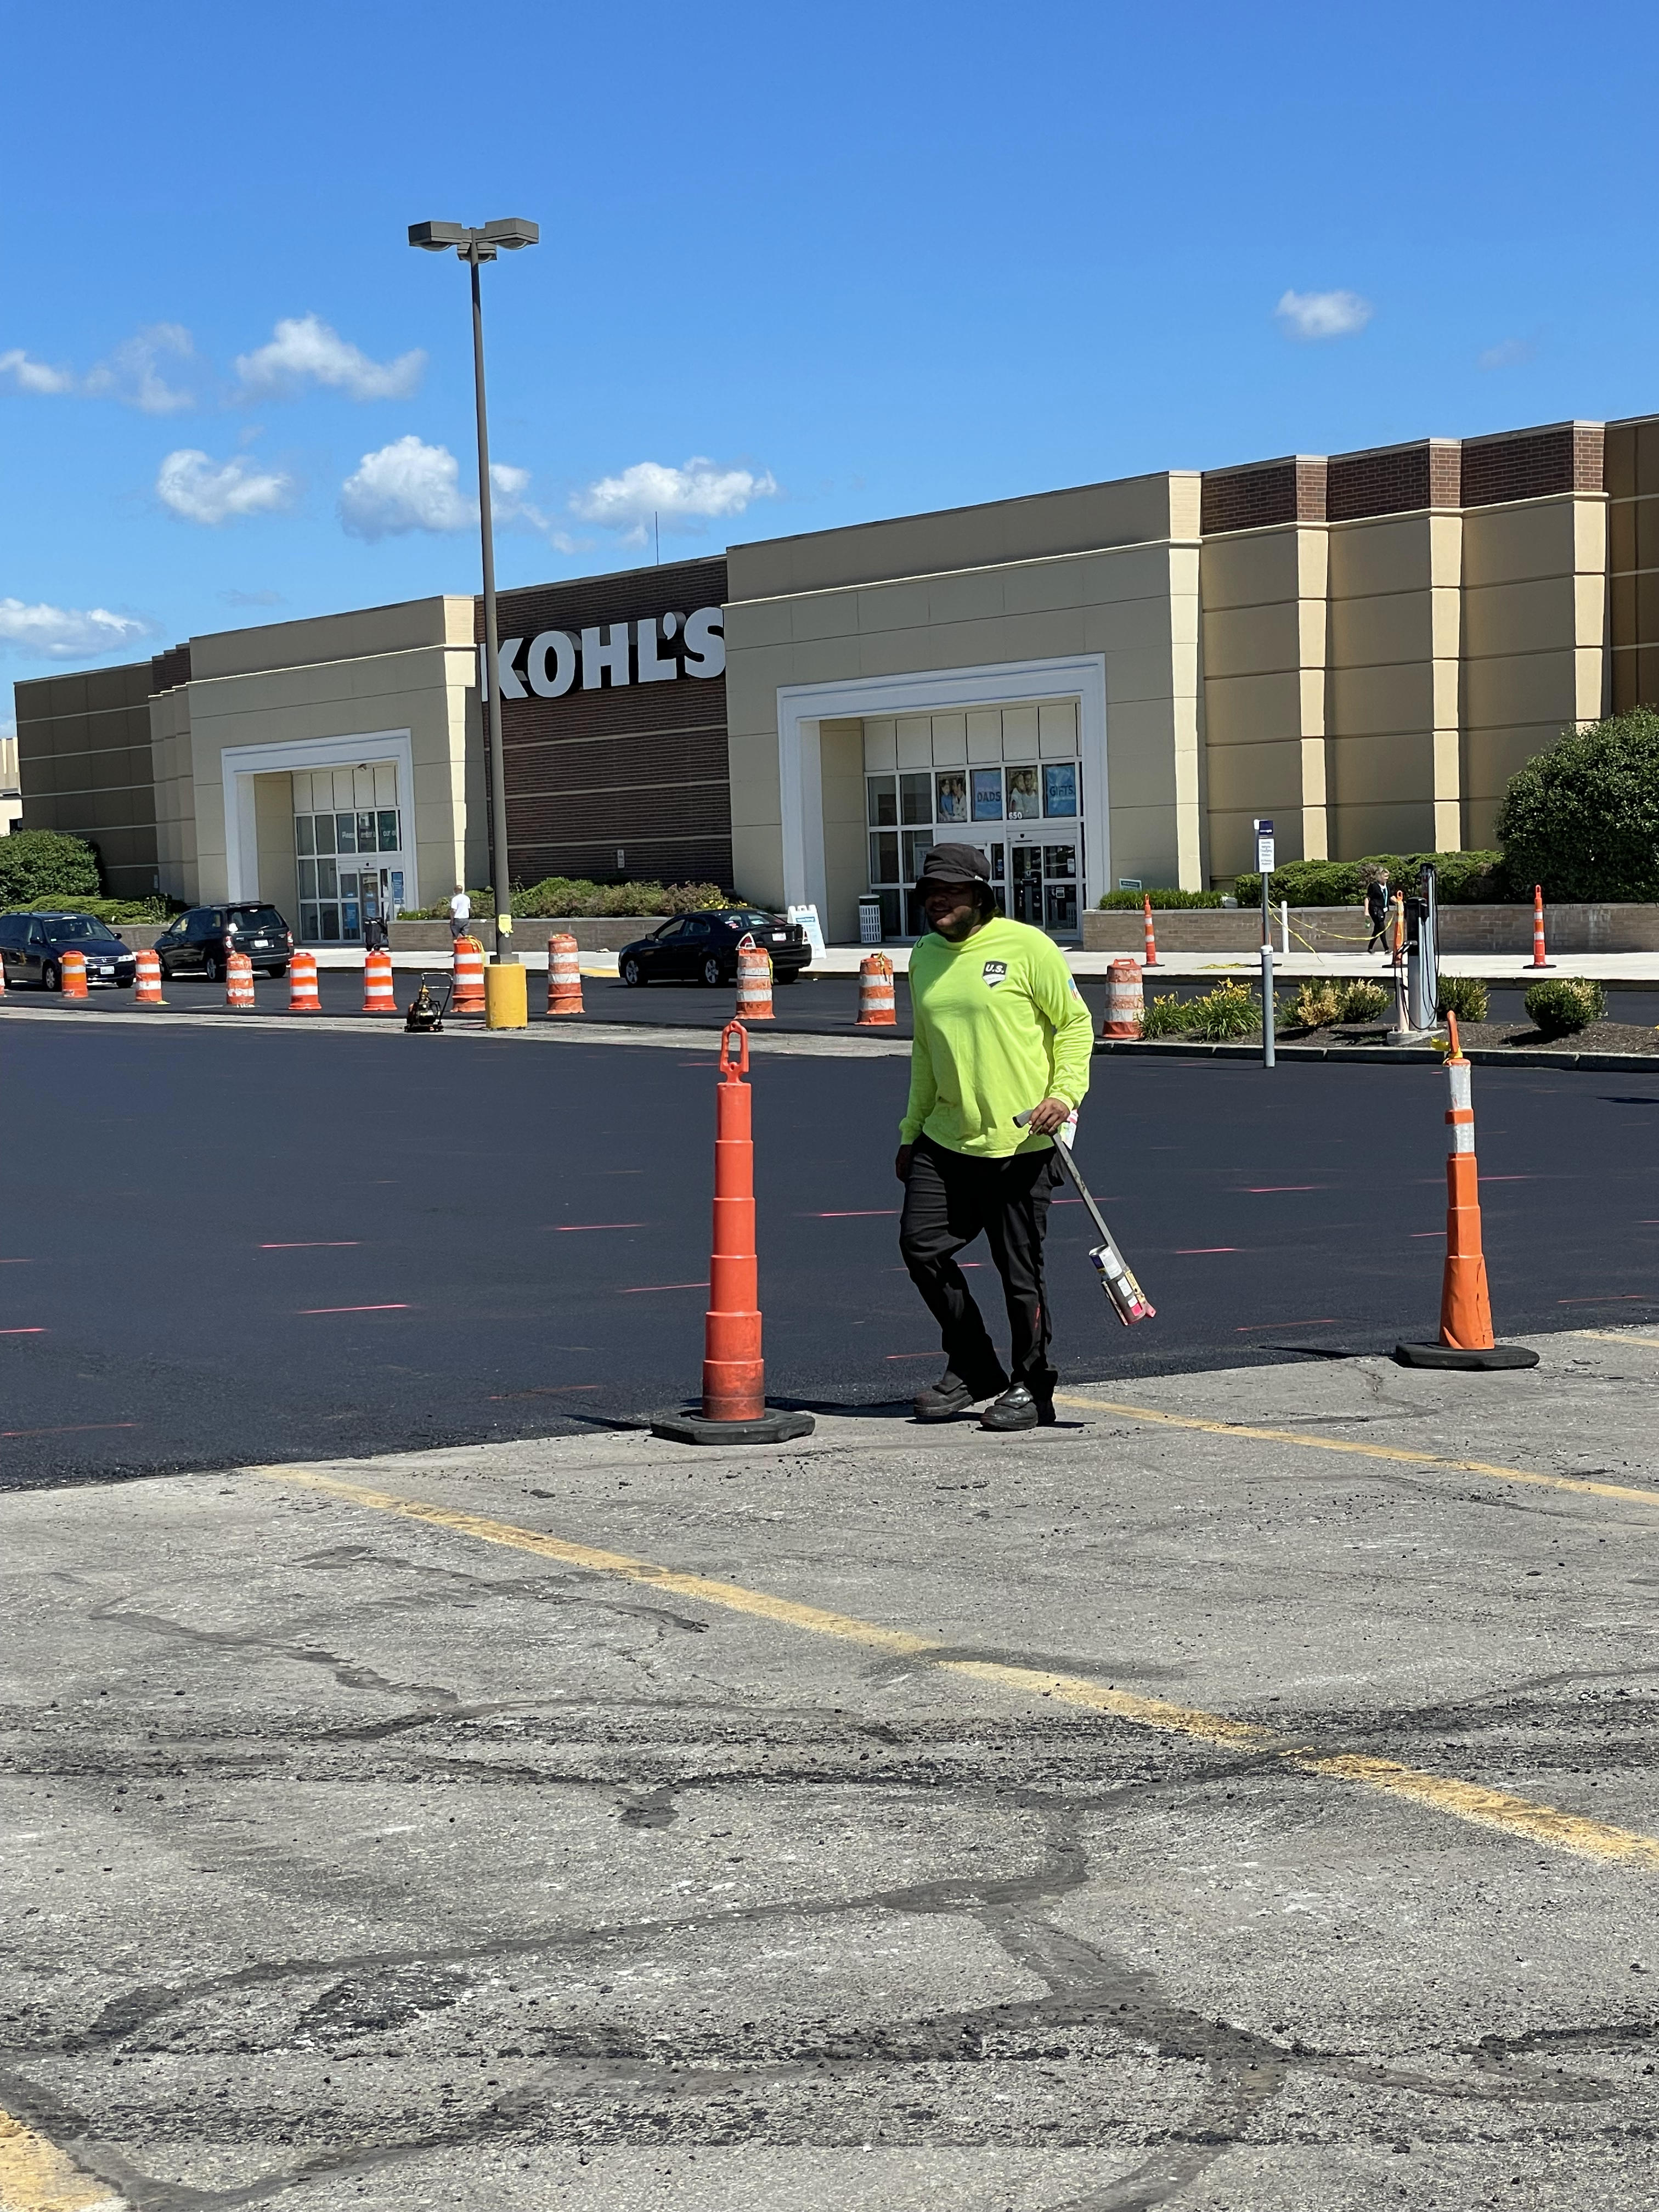 kohls rhode island pavement parking